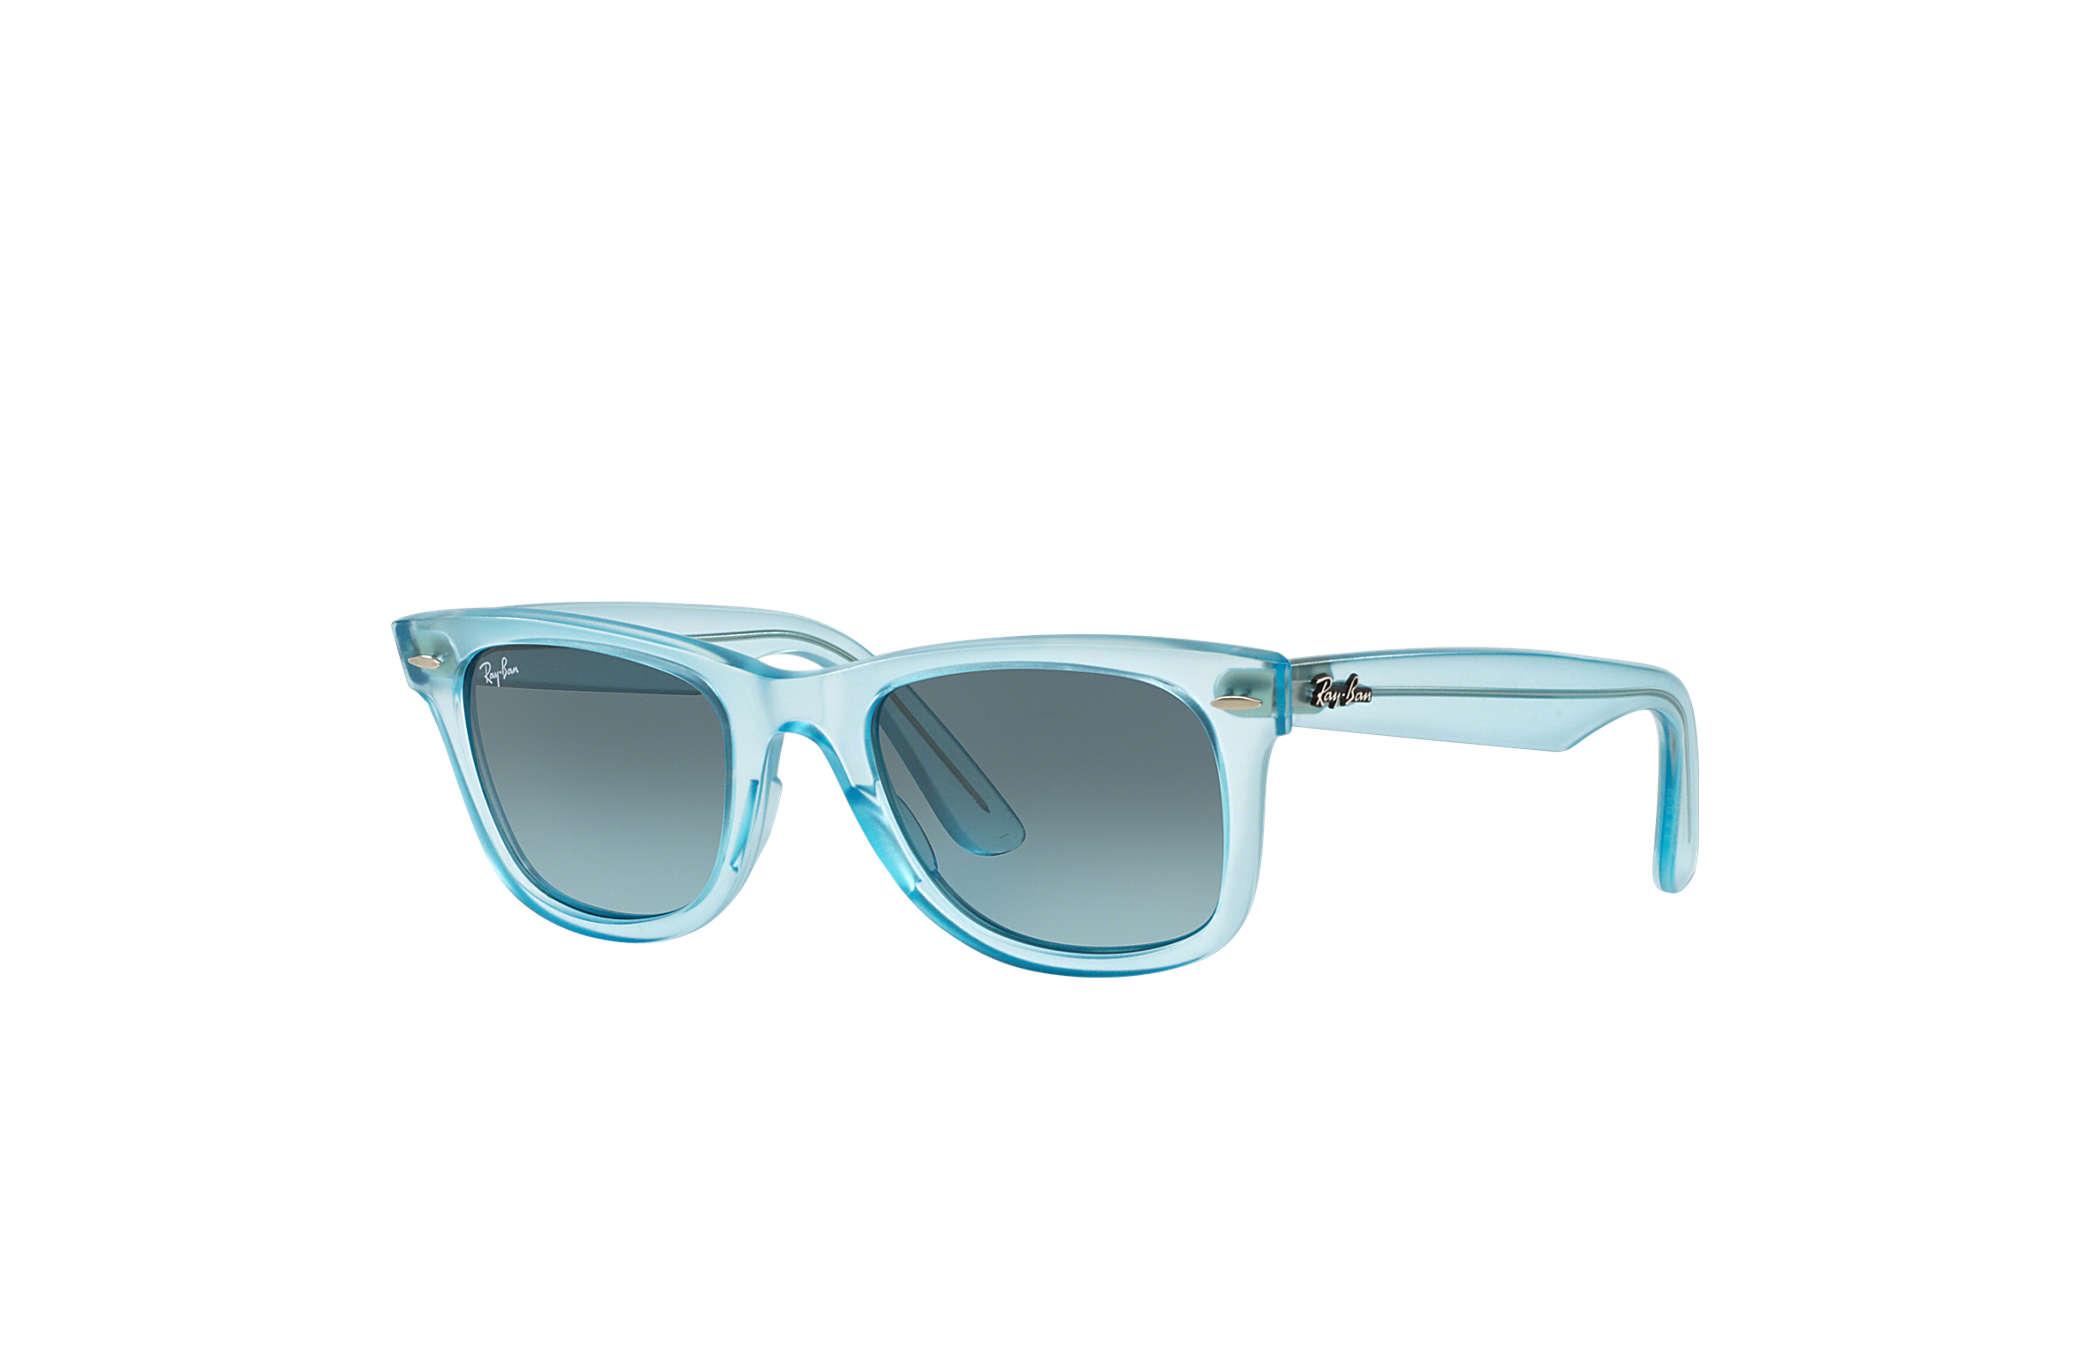 ray ban wayfarer turquoise  ray ban 0rb2140 original wayfarer ice pops light blue sun